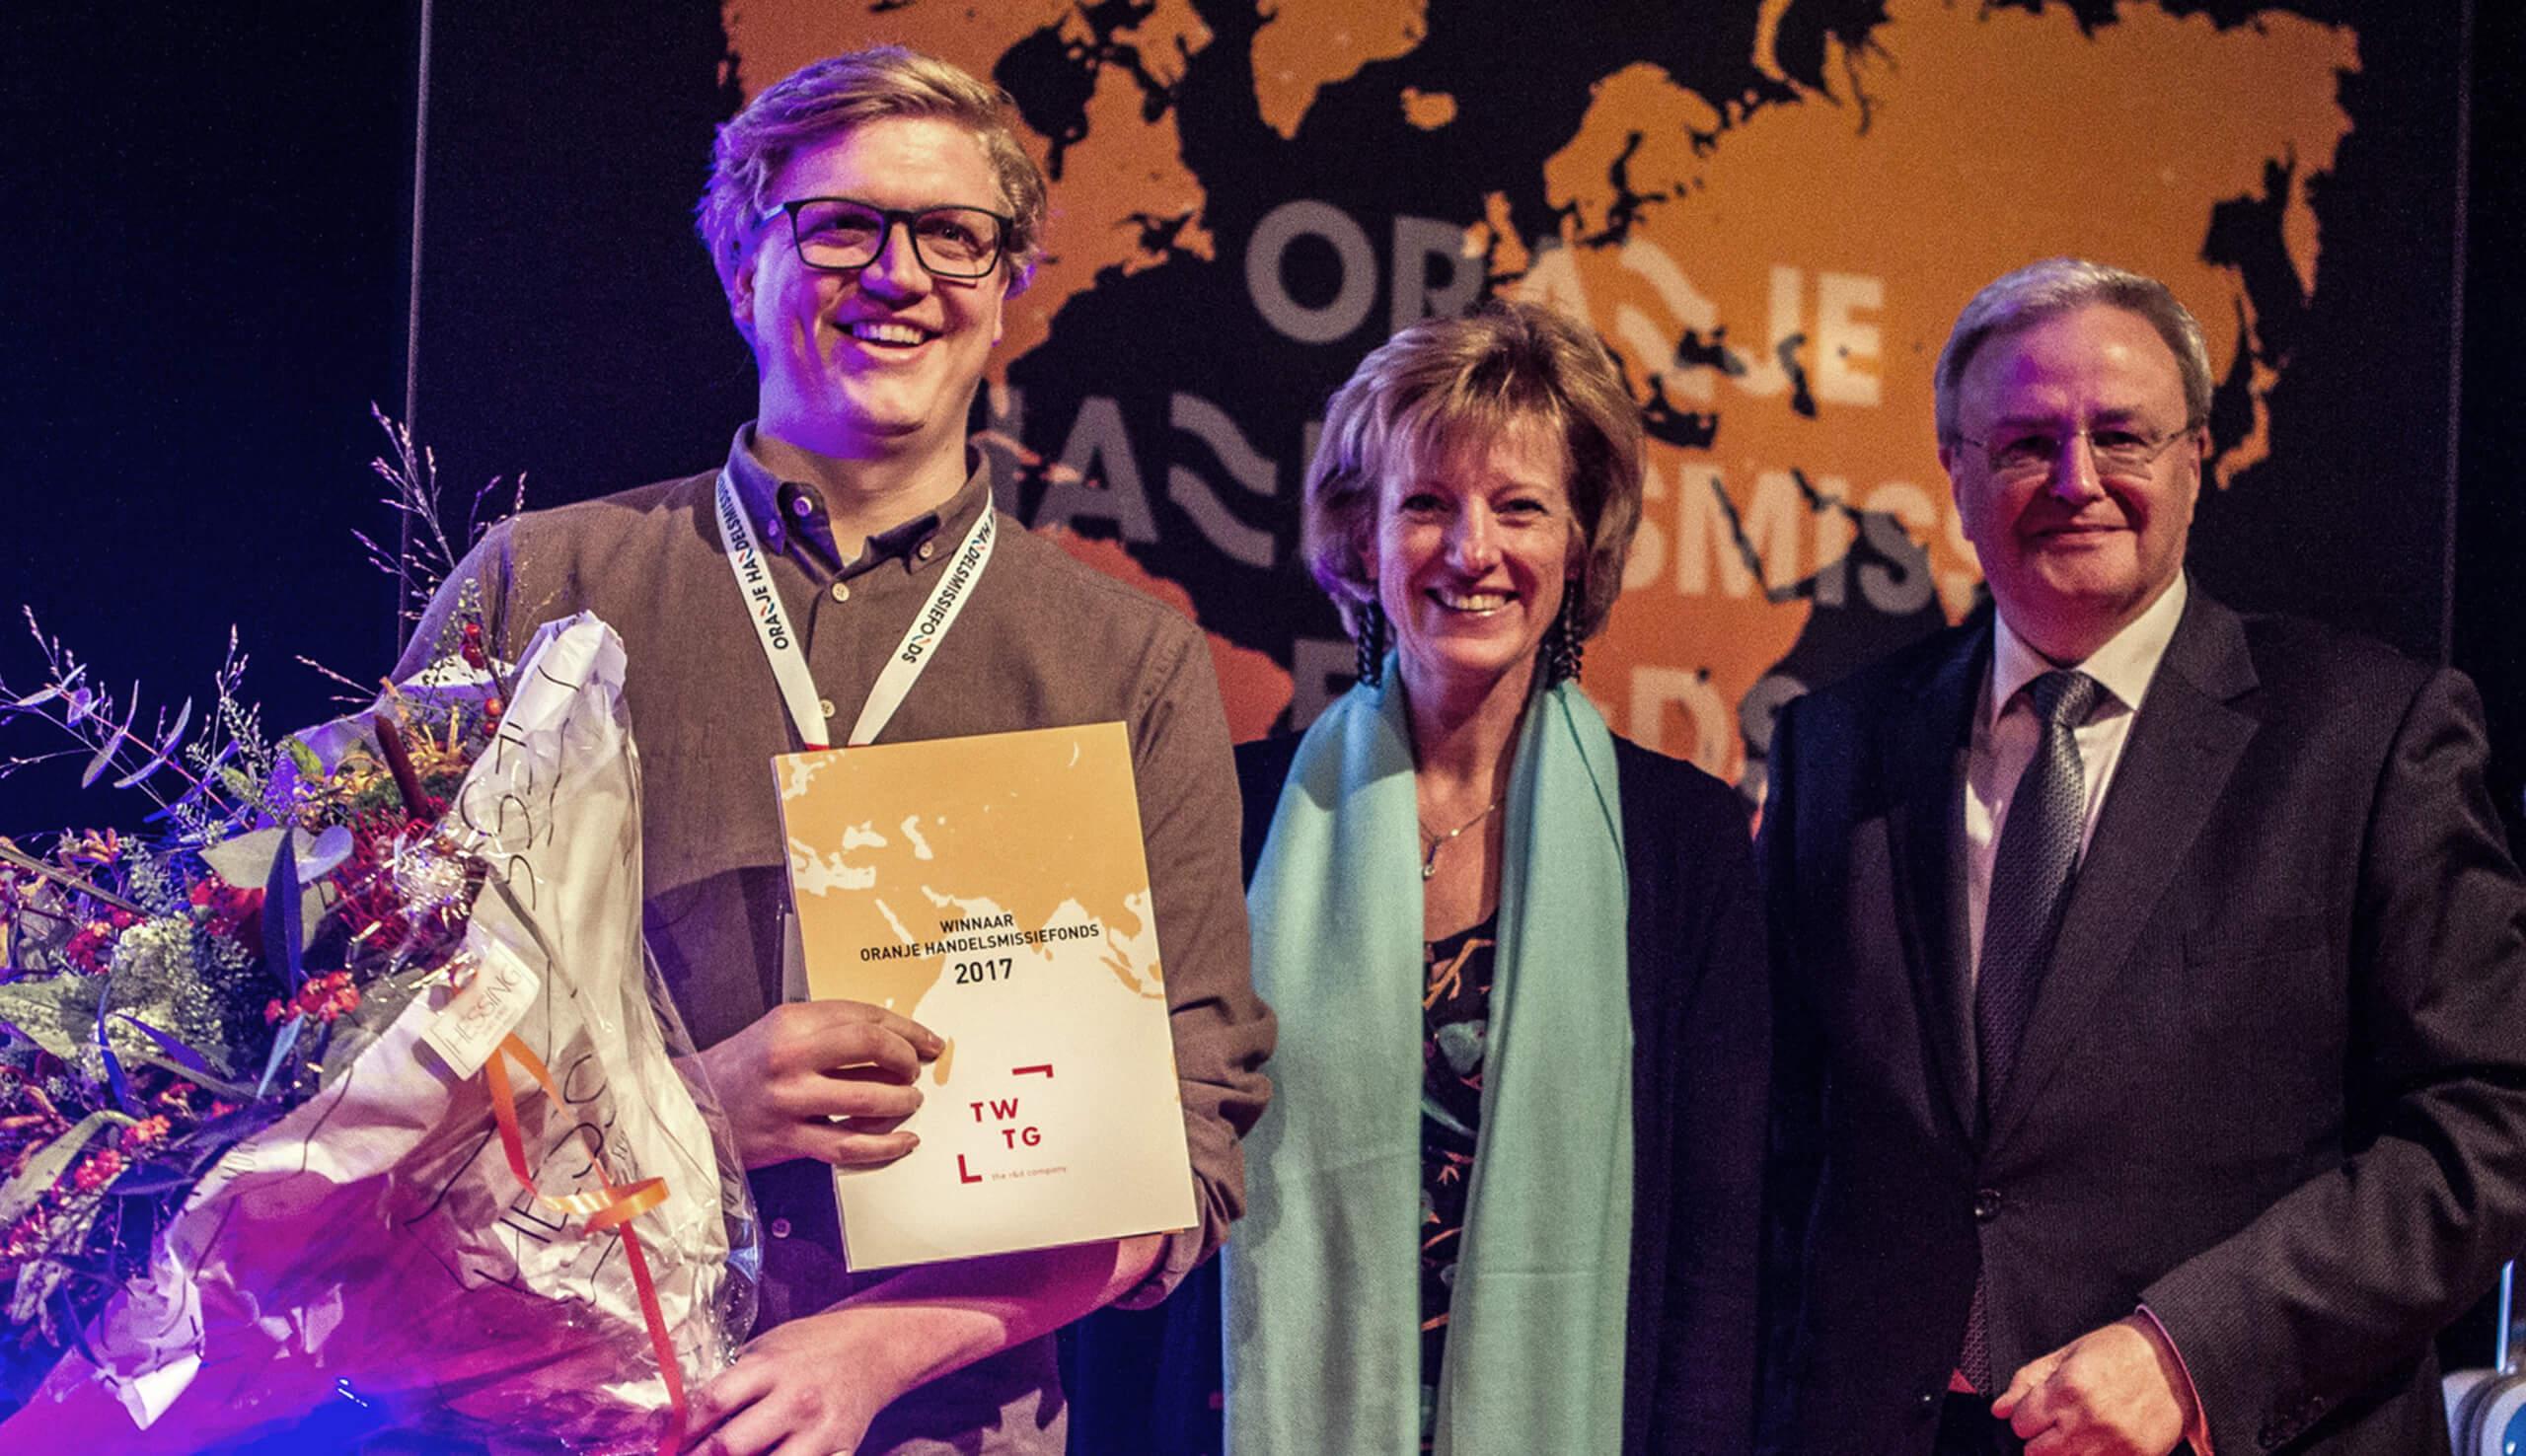 TWTG wins Orange Tradefund (OHMF)